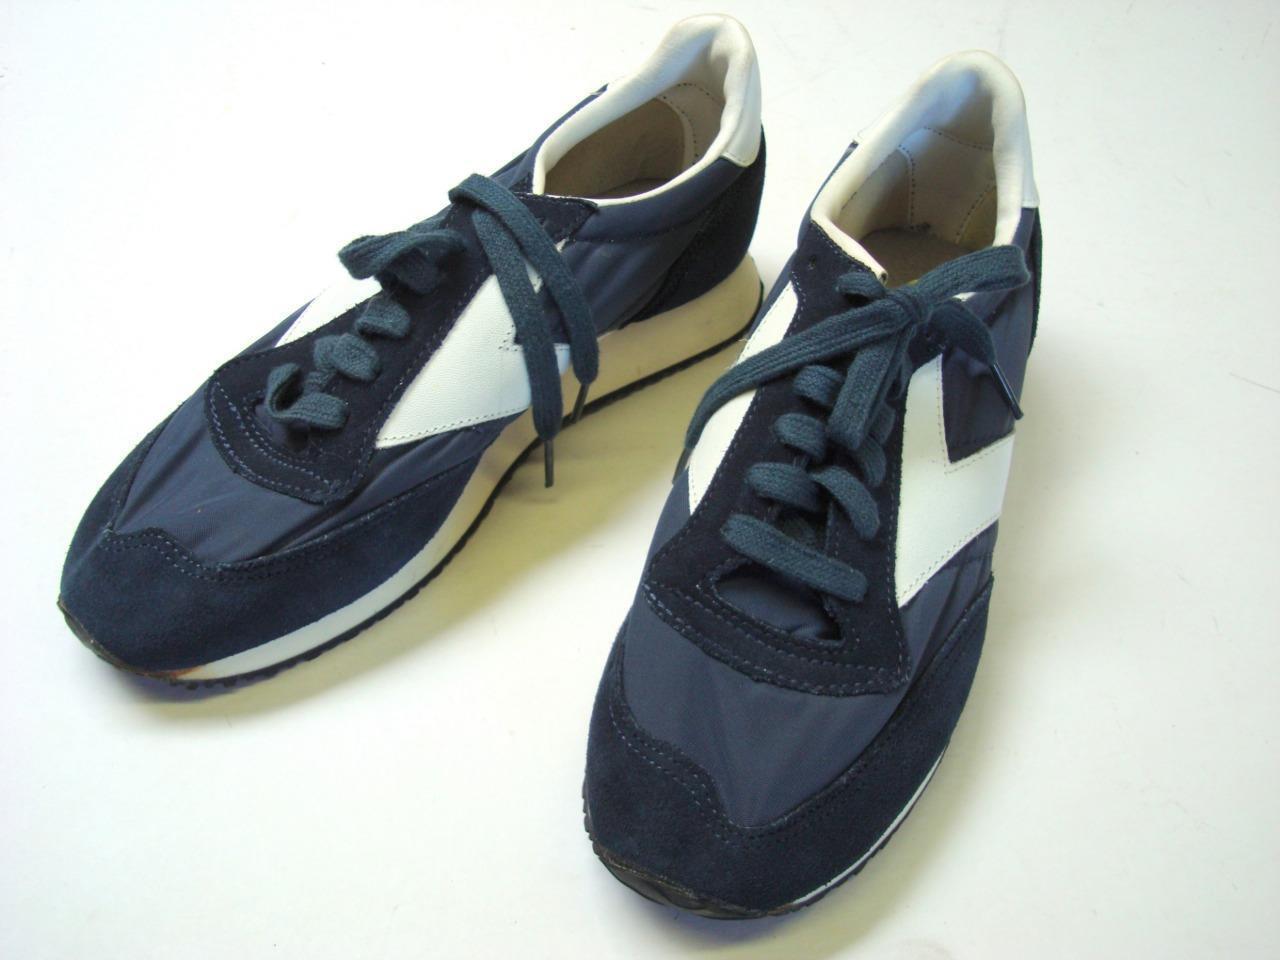 newest ca7e4 f561c Vintage Mens Brooks Athletic schuhe schuhe schuhe sz 7.5 Navy Blau  Weiß -  unworn - no box 00b6a2